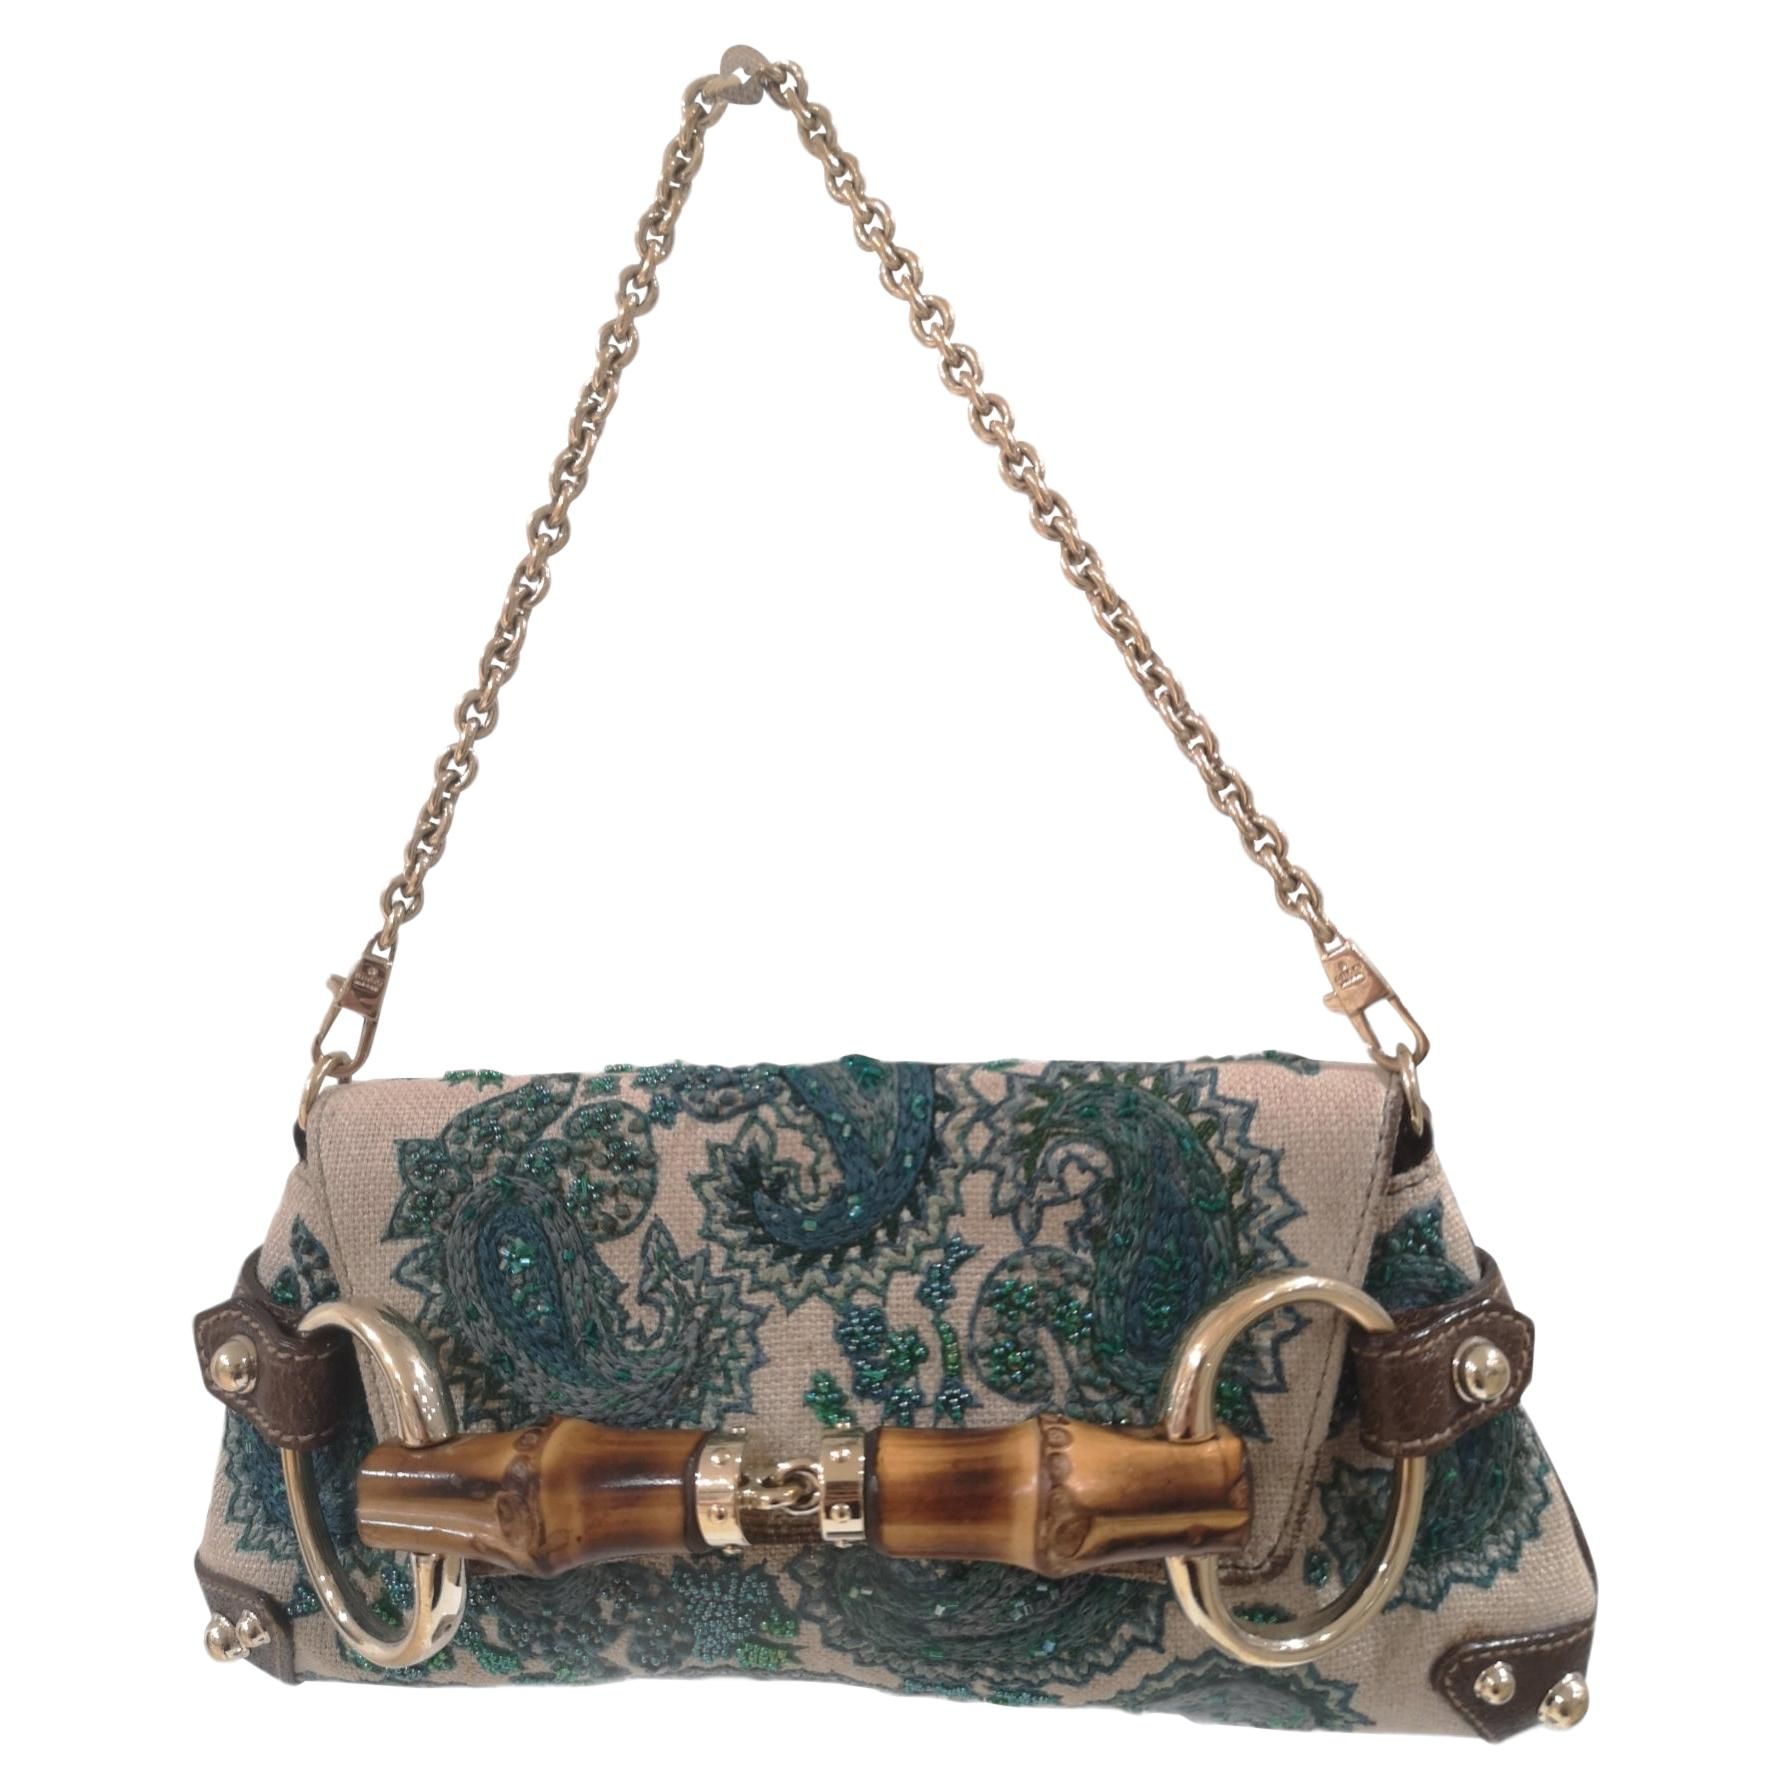 Gucci bamboo handbeaded shoulder handle bag